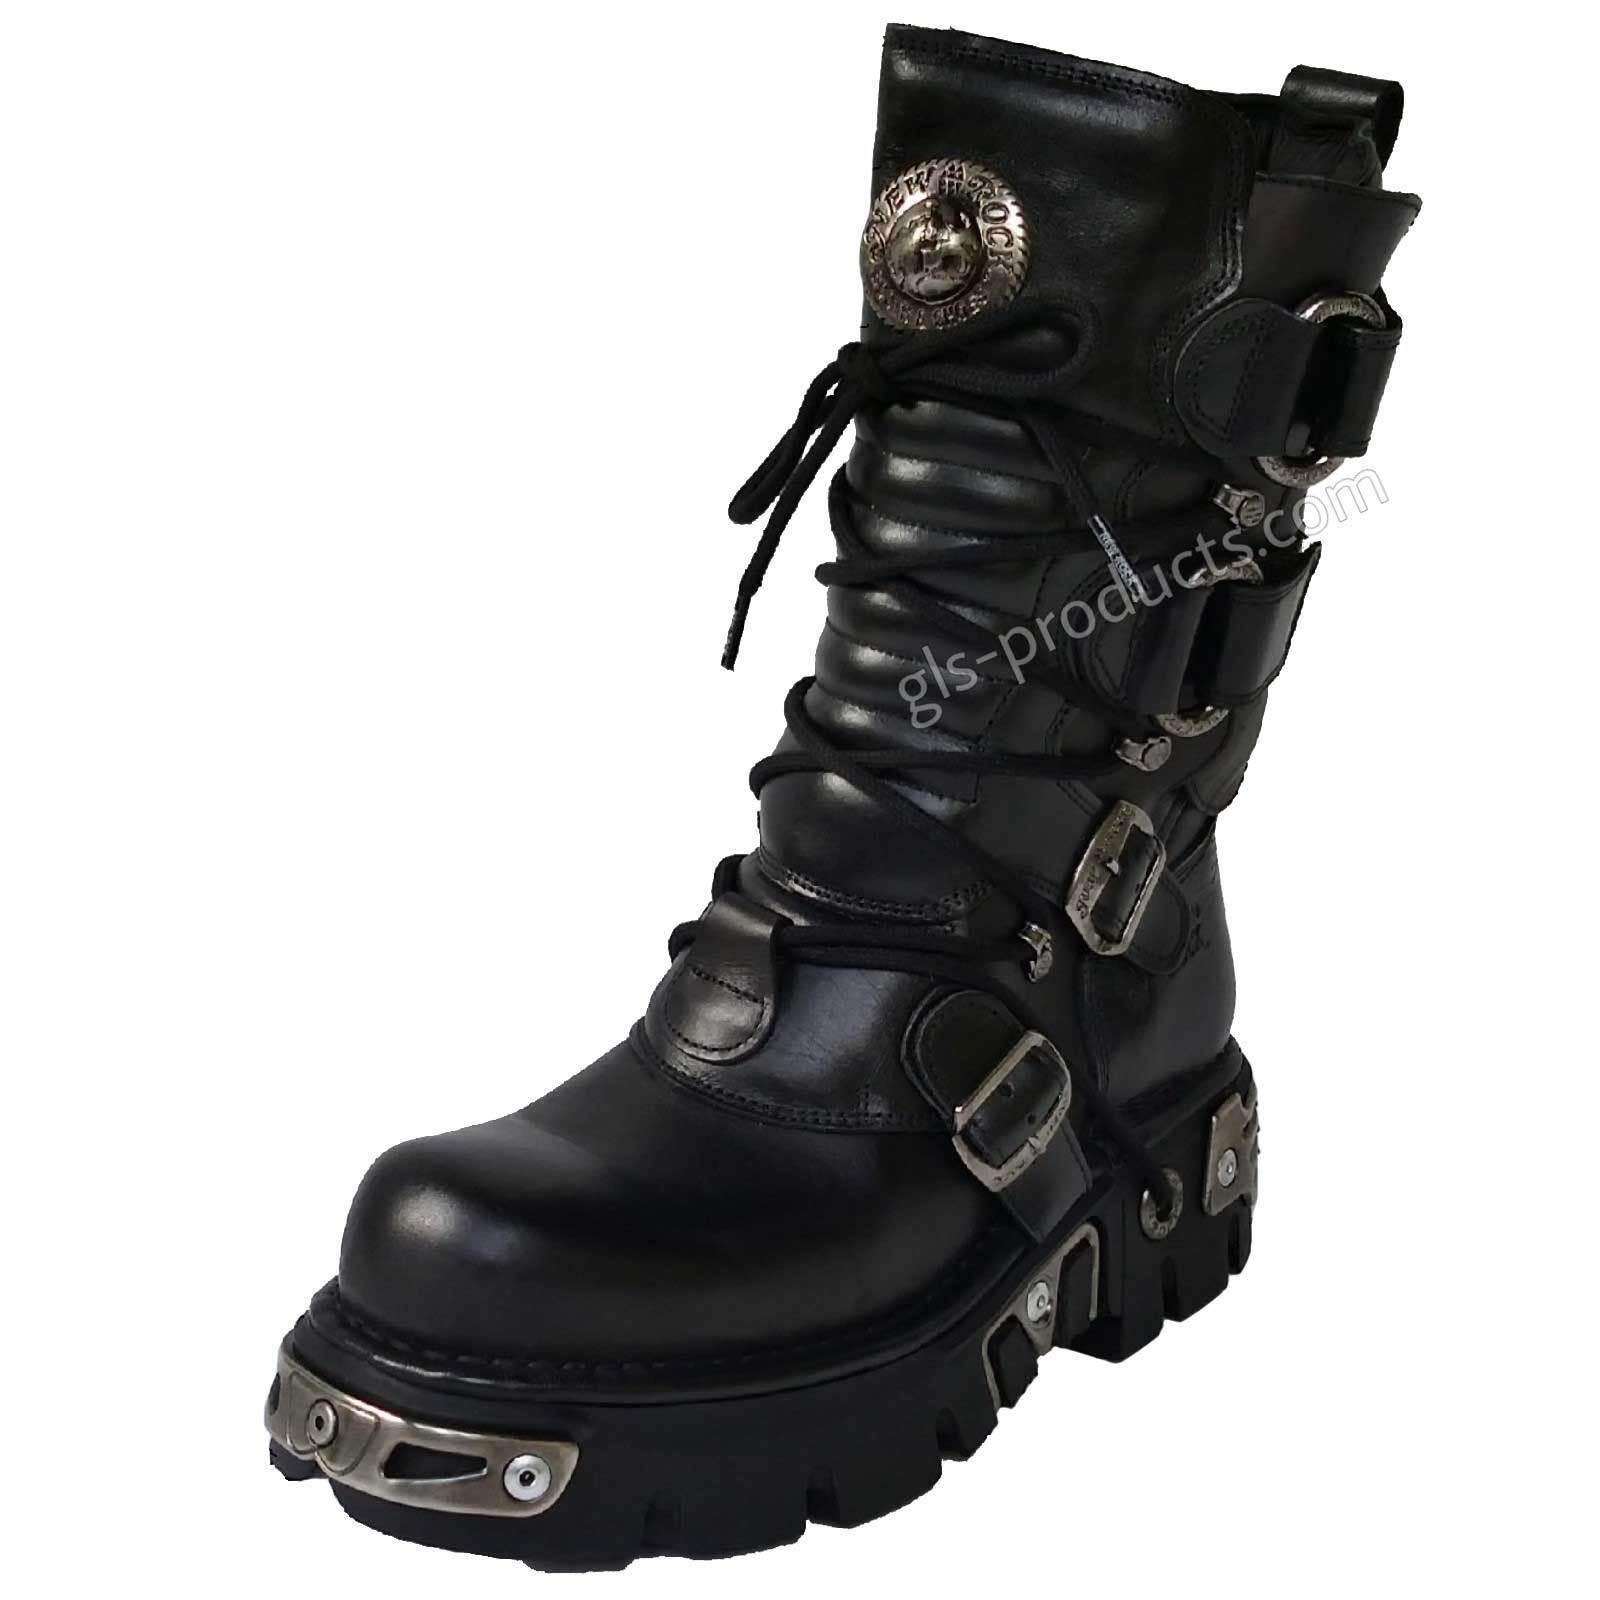 New Rock 575 Stiefel Gothic Streetfighter Style Darkwear Metal genuine leather top